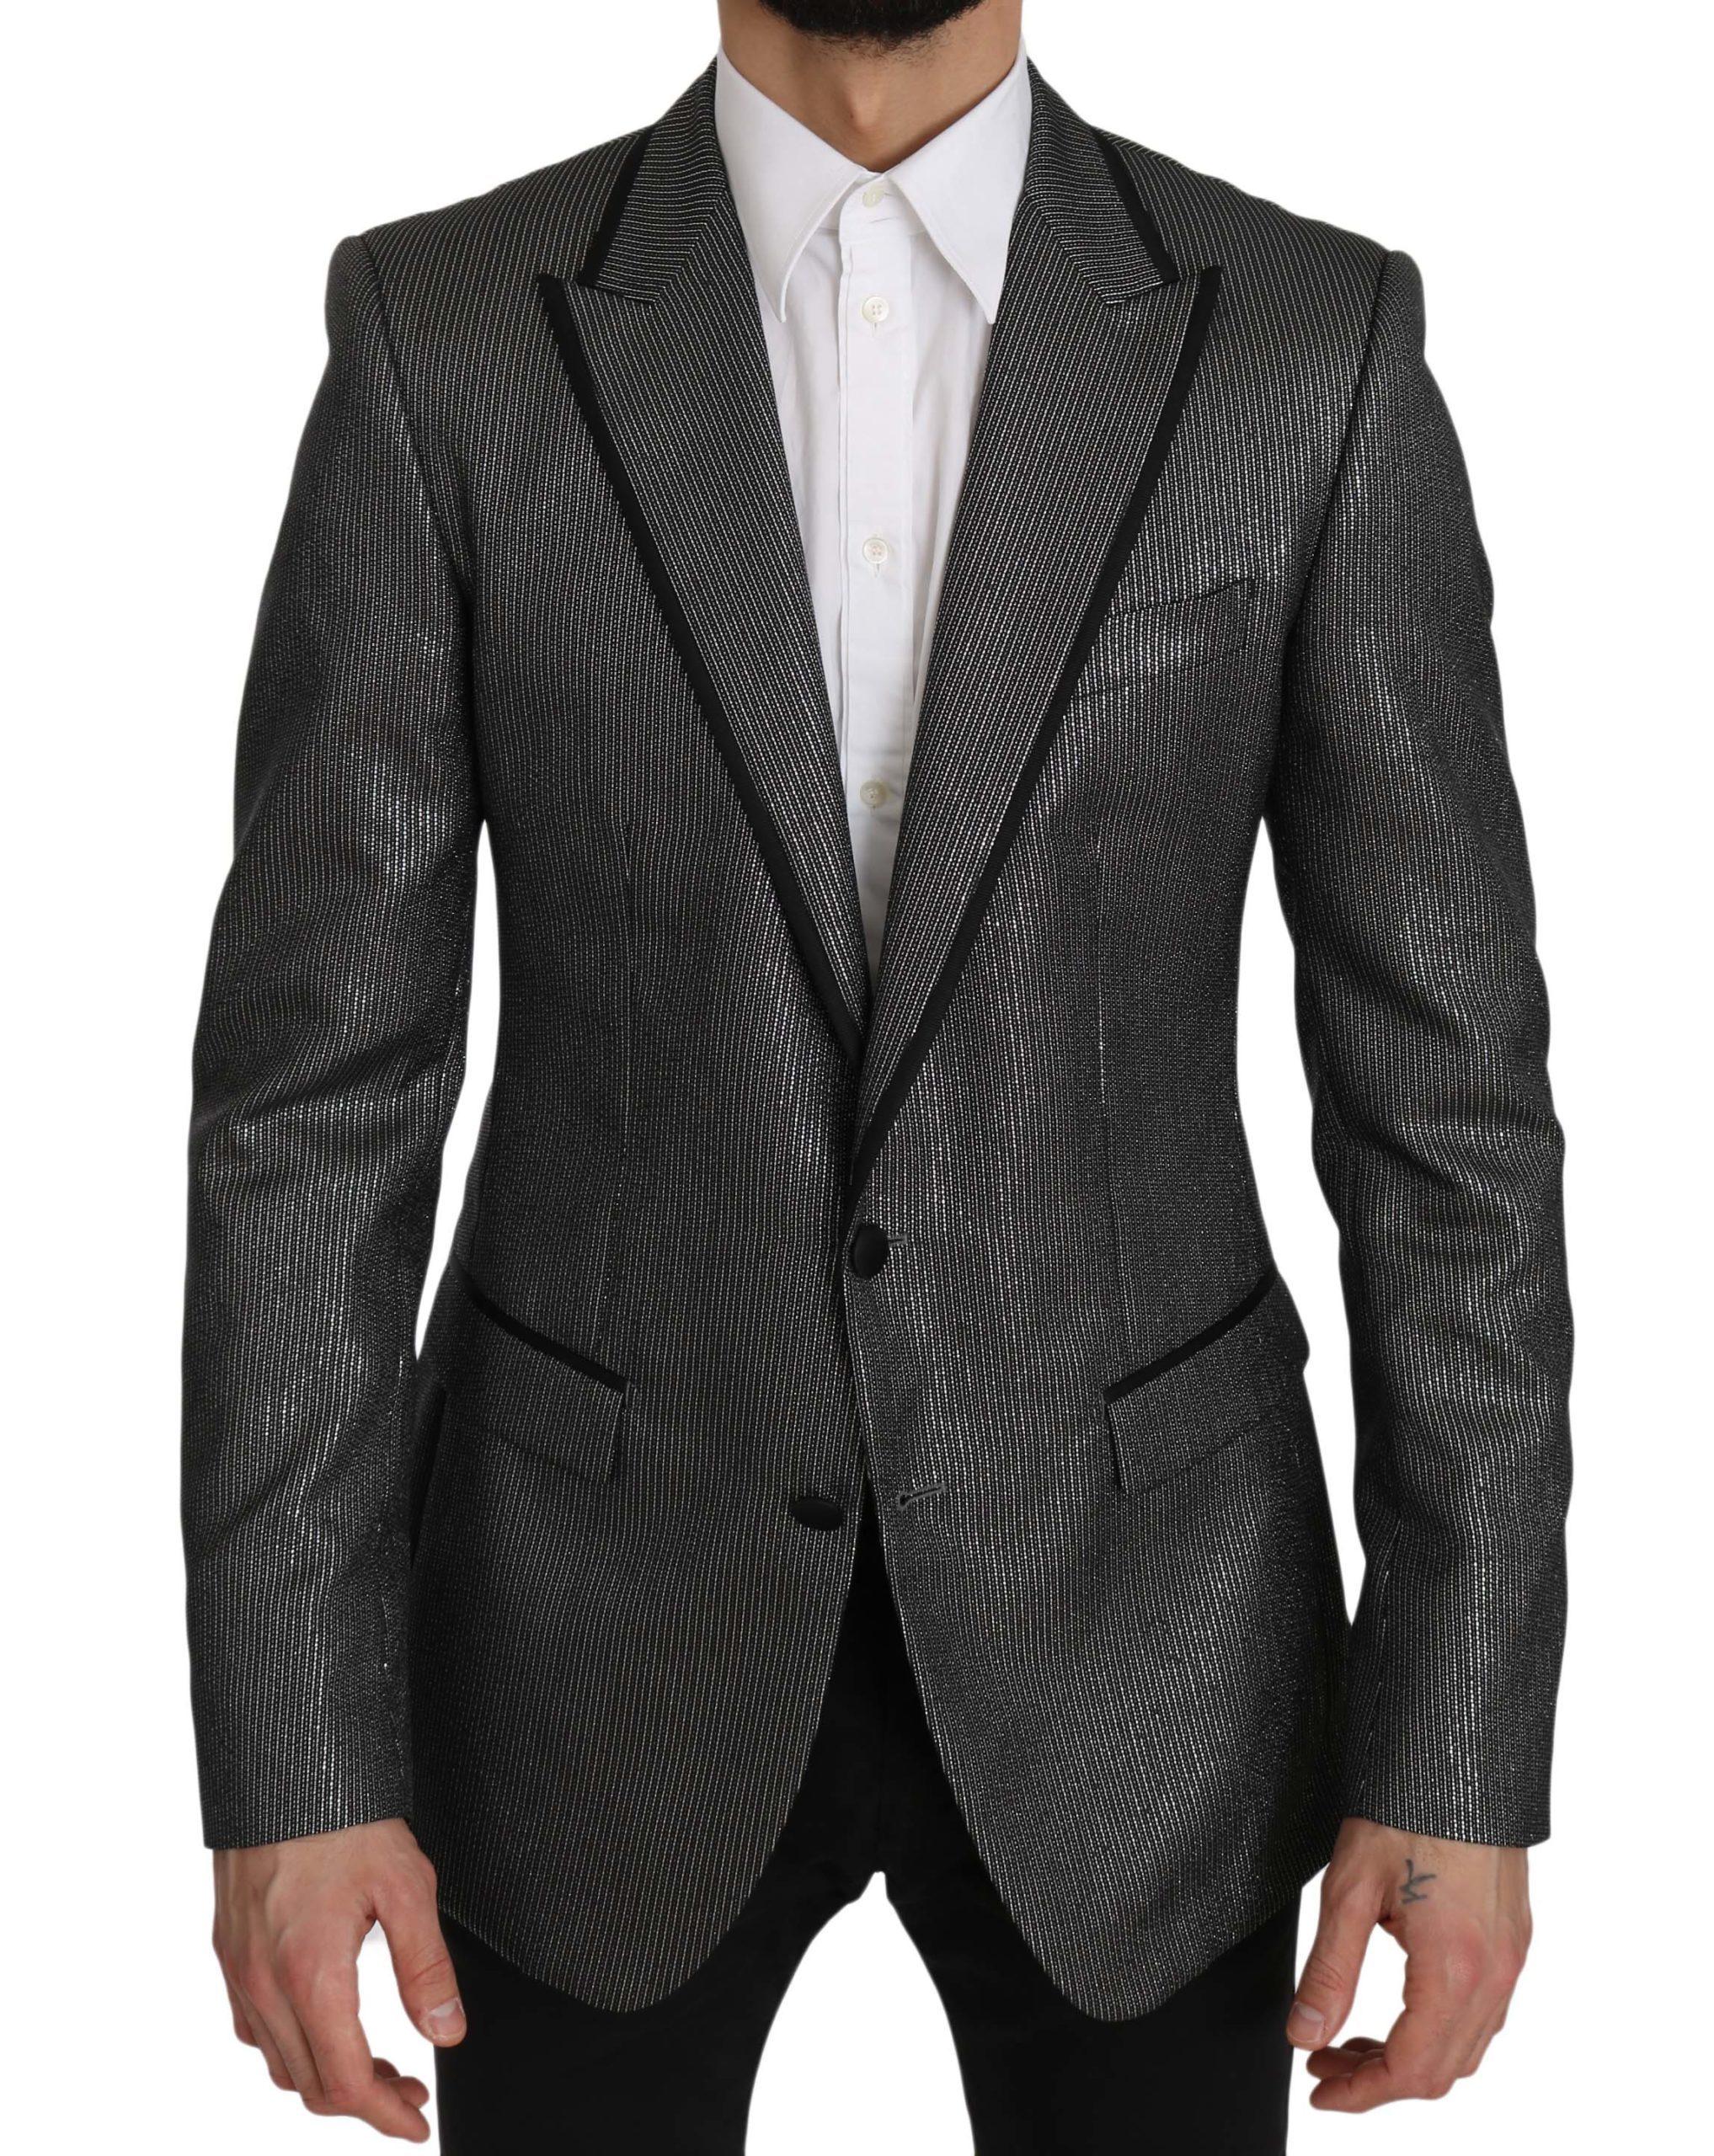 Dolce & Gabbana Men's Striped MARTINI Slim Blazer Gray JKT2364 - IT48 | M